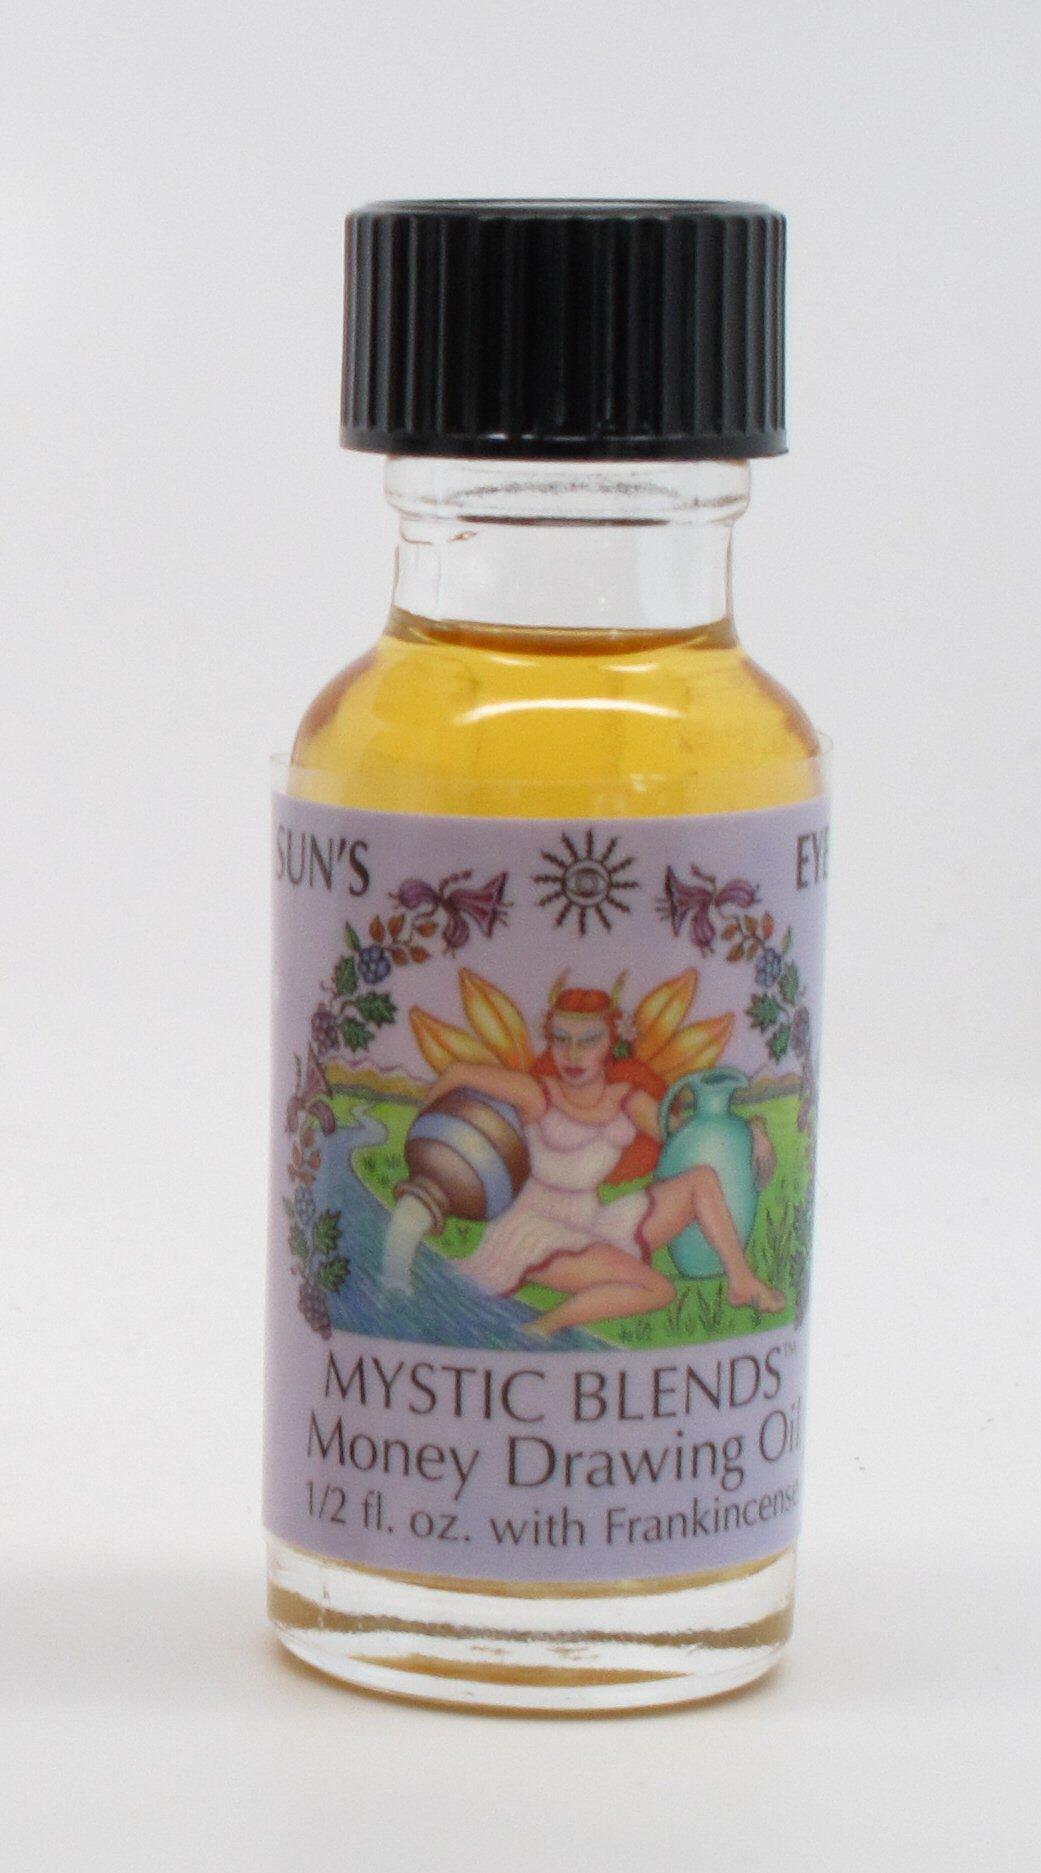 Money Drawing - Sun's Eye Mystic Blends Oils - 1/2 Ounce Bottle